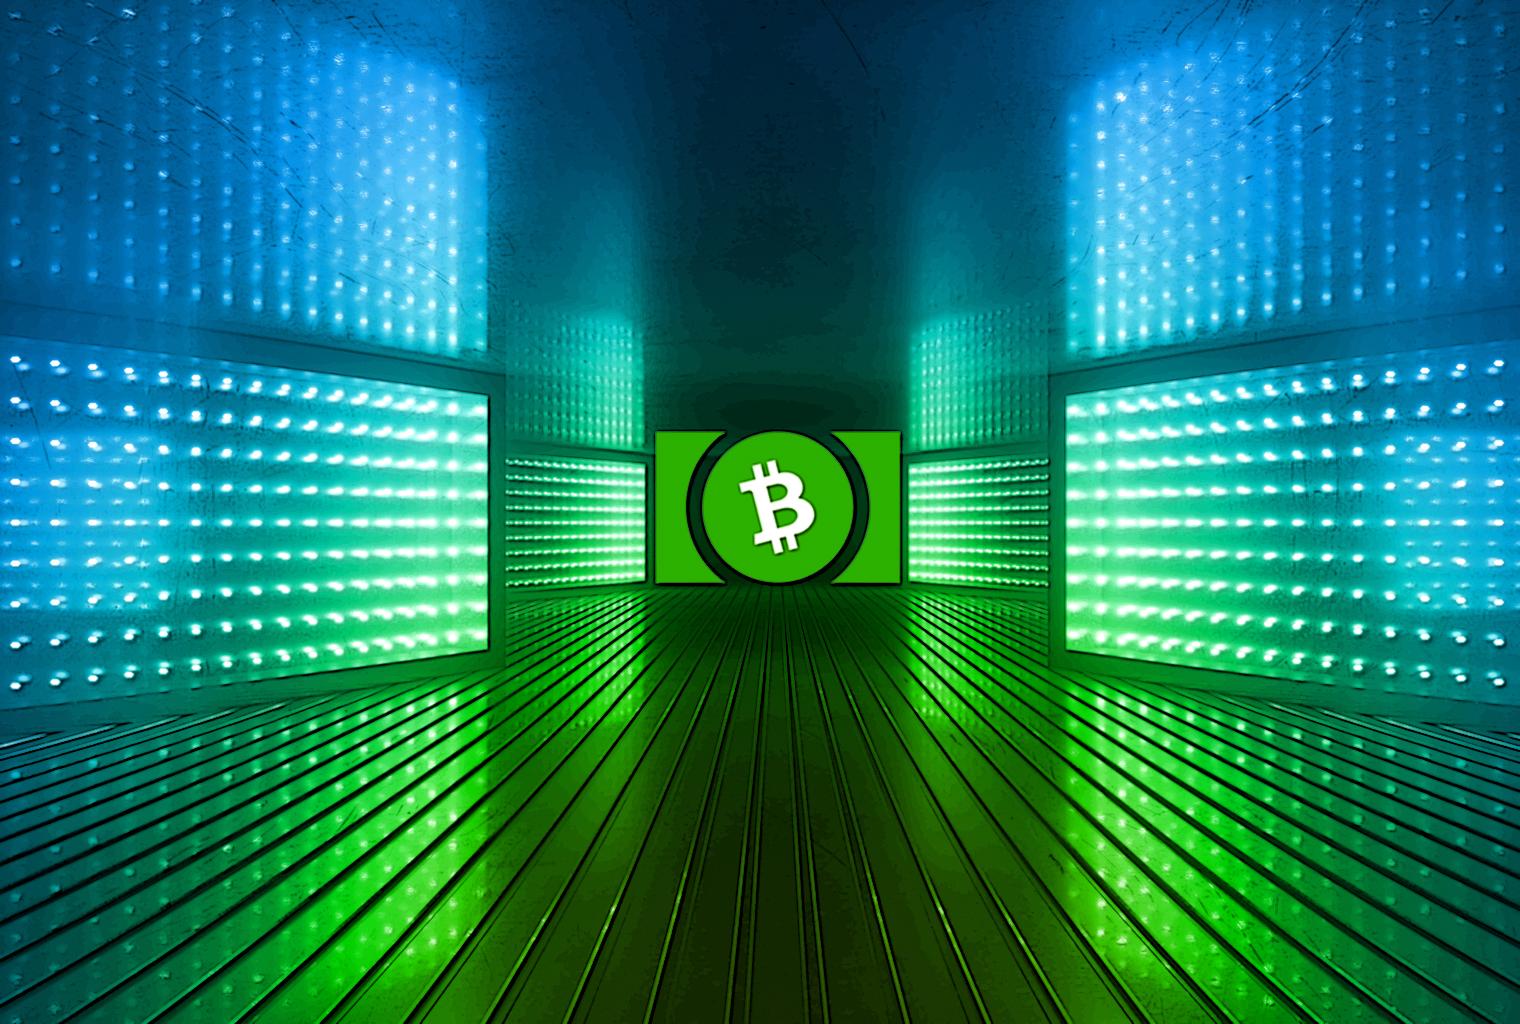 Actualización completa de Bitcoin Cash: 2 nuevos cambios de protocolo agregados